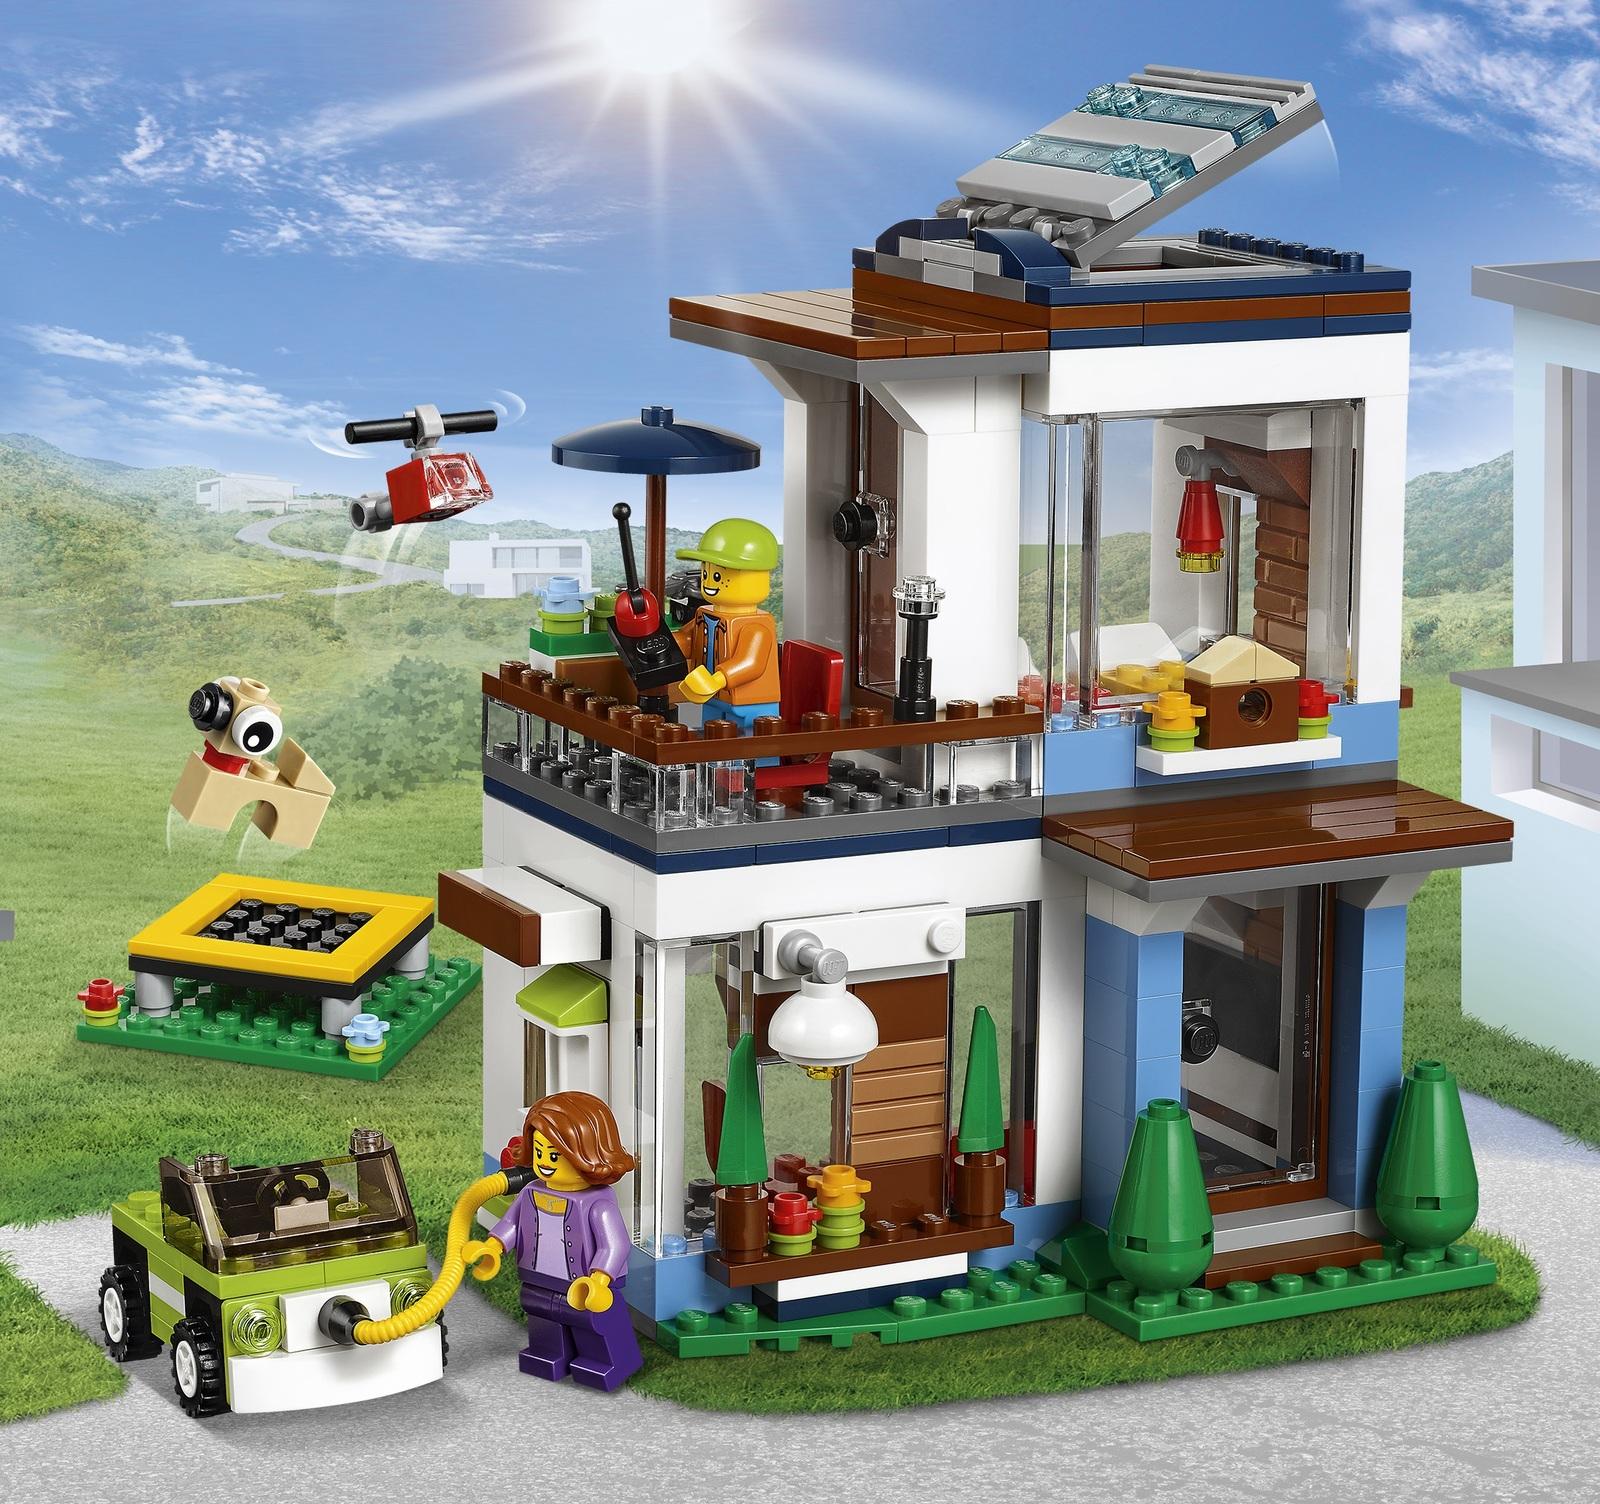 LEGO Creator: Modern Home (31068) image